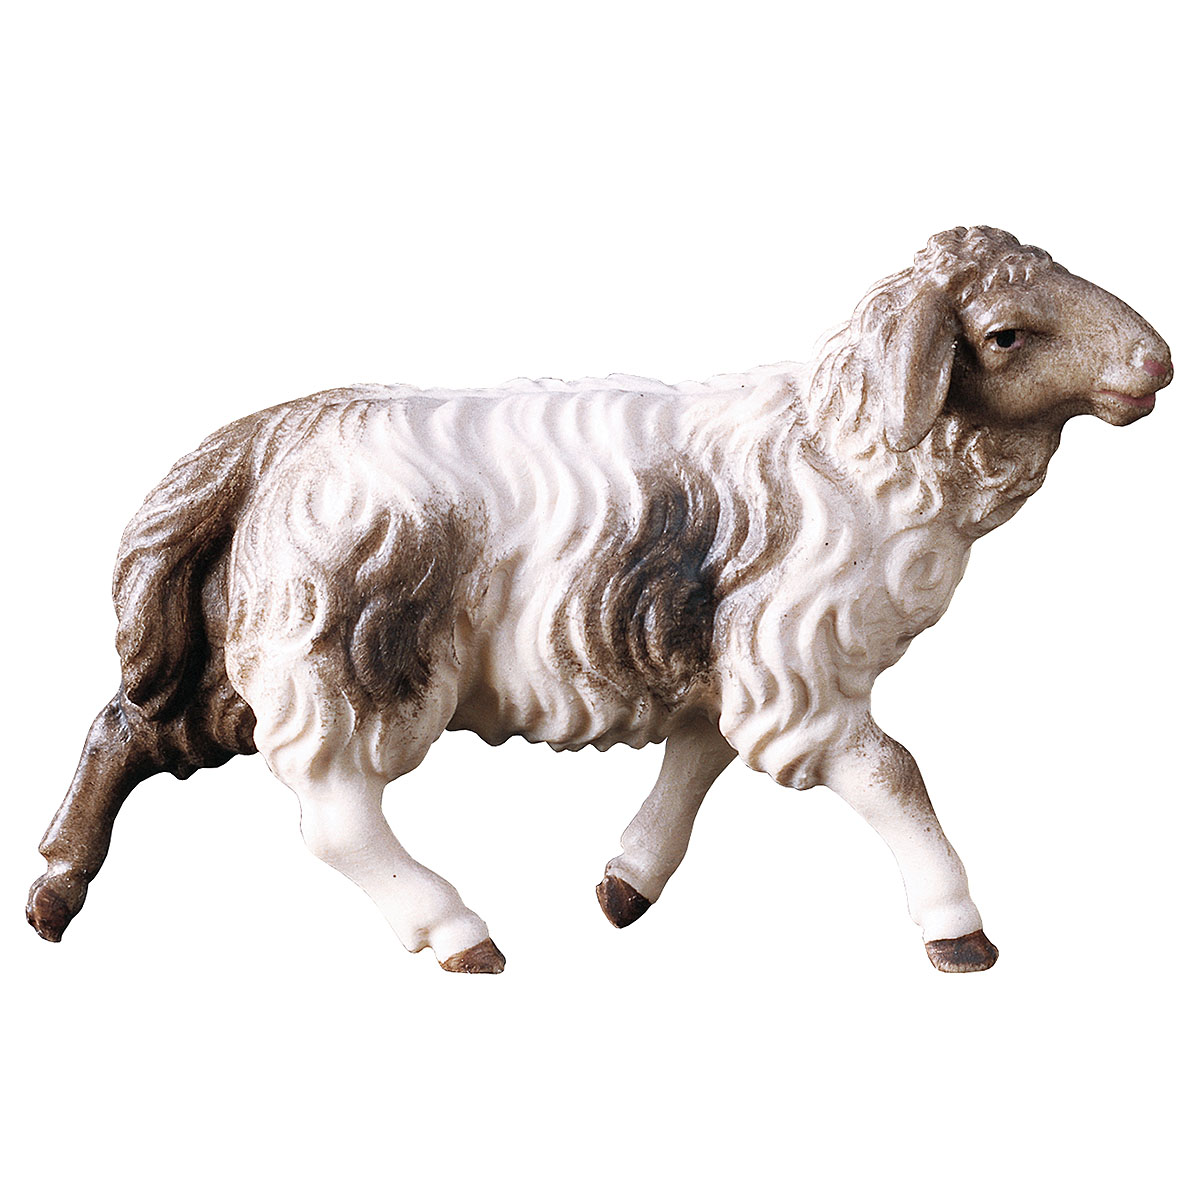 Schaf laufend, fleckig